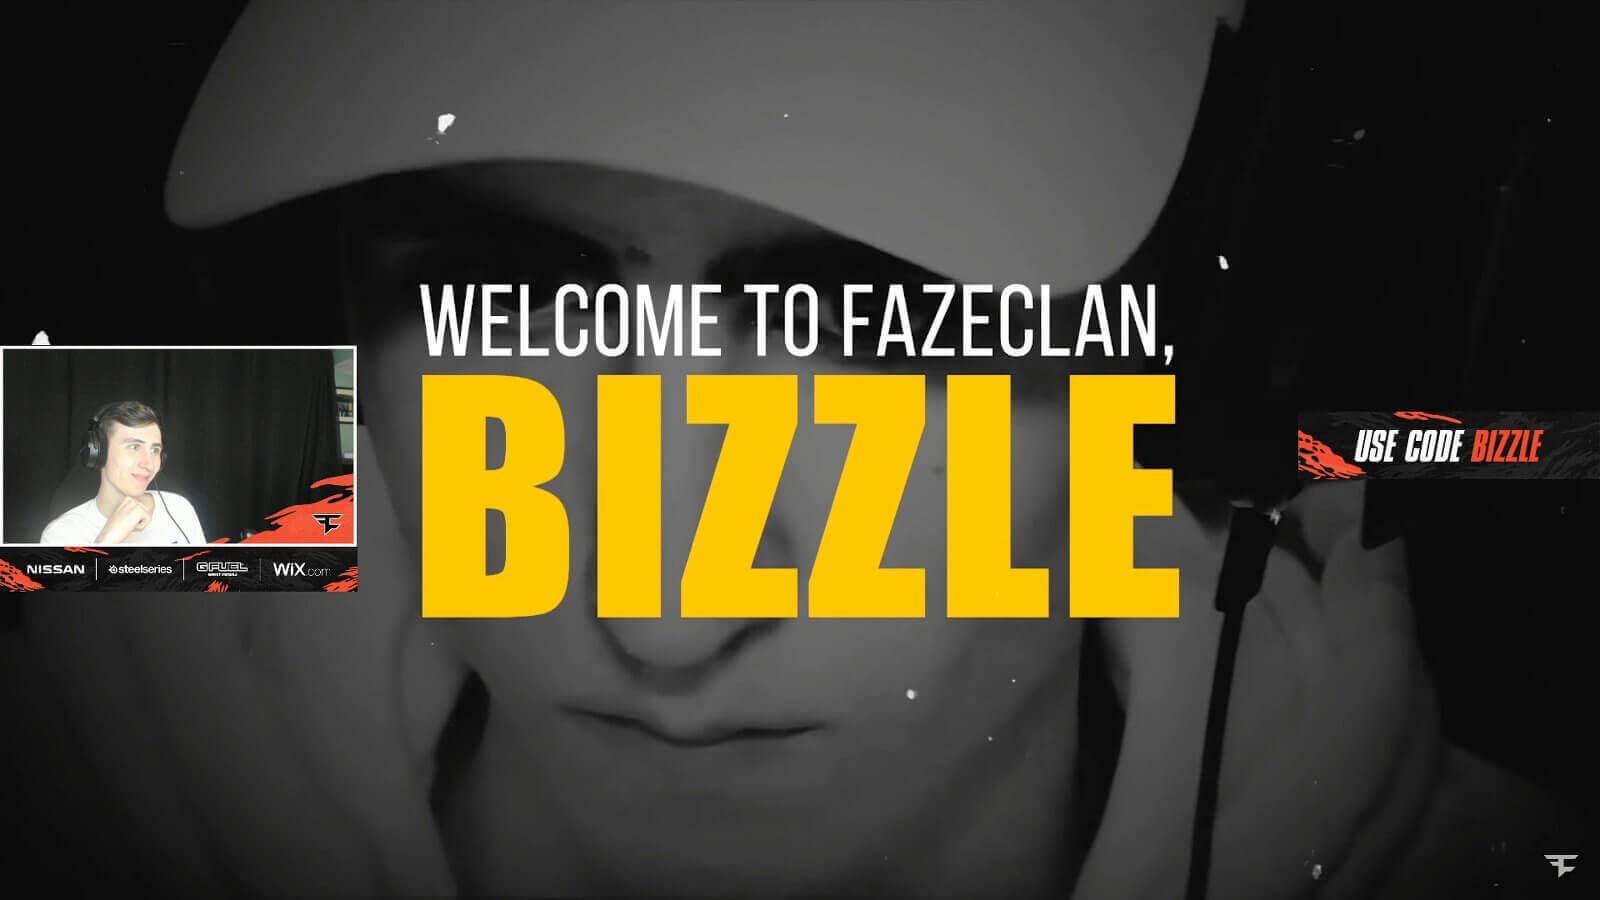 Bizzle joins Faze as team doubles down on Fortnite